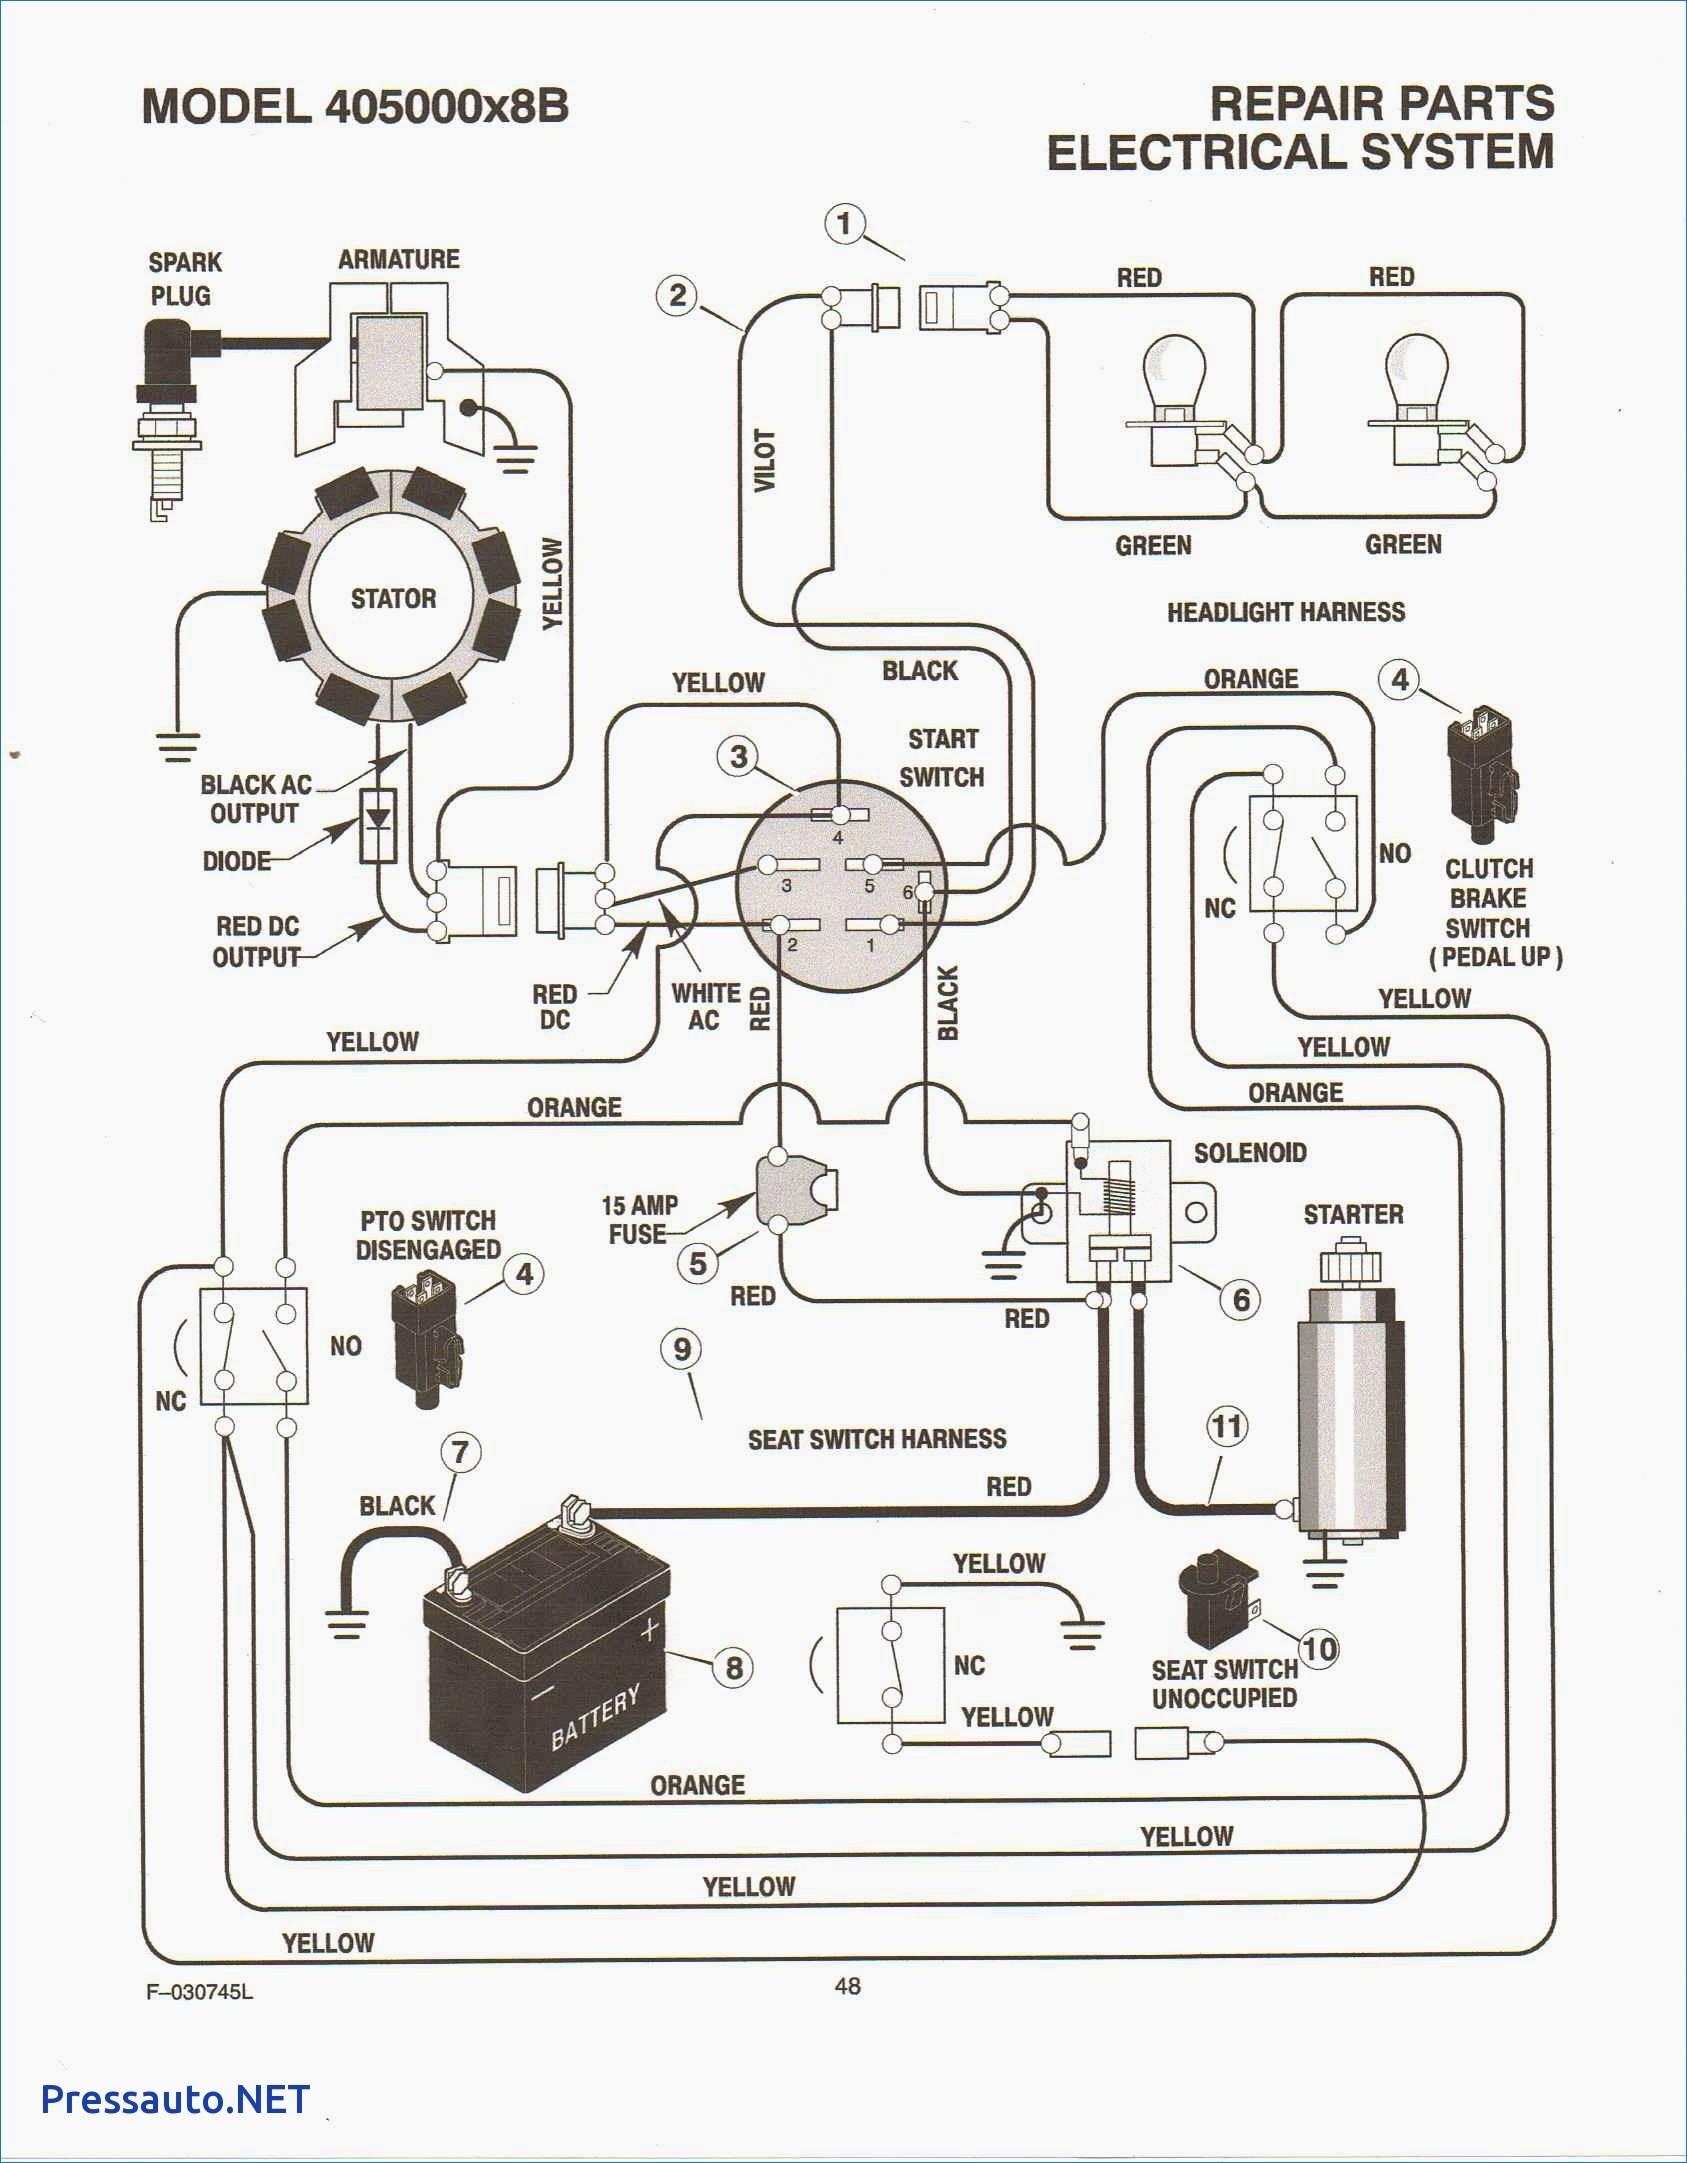 John Deere 180 Wiring Harness - Wiring Diagram K10 on